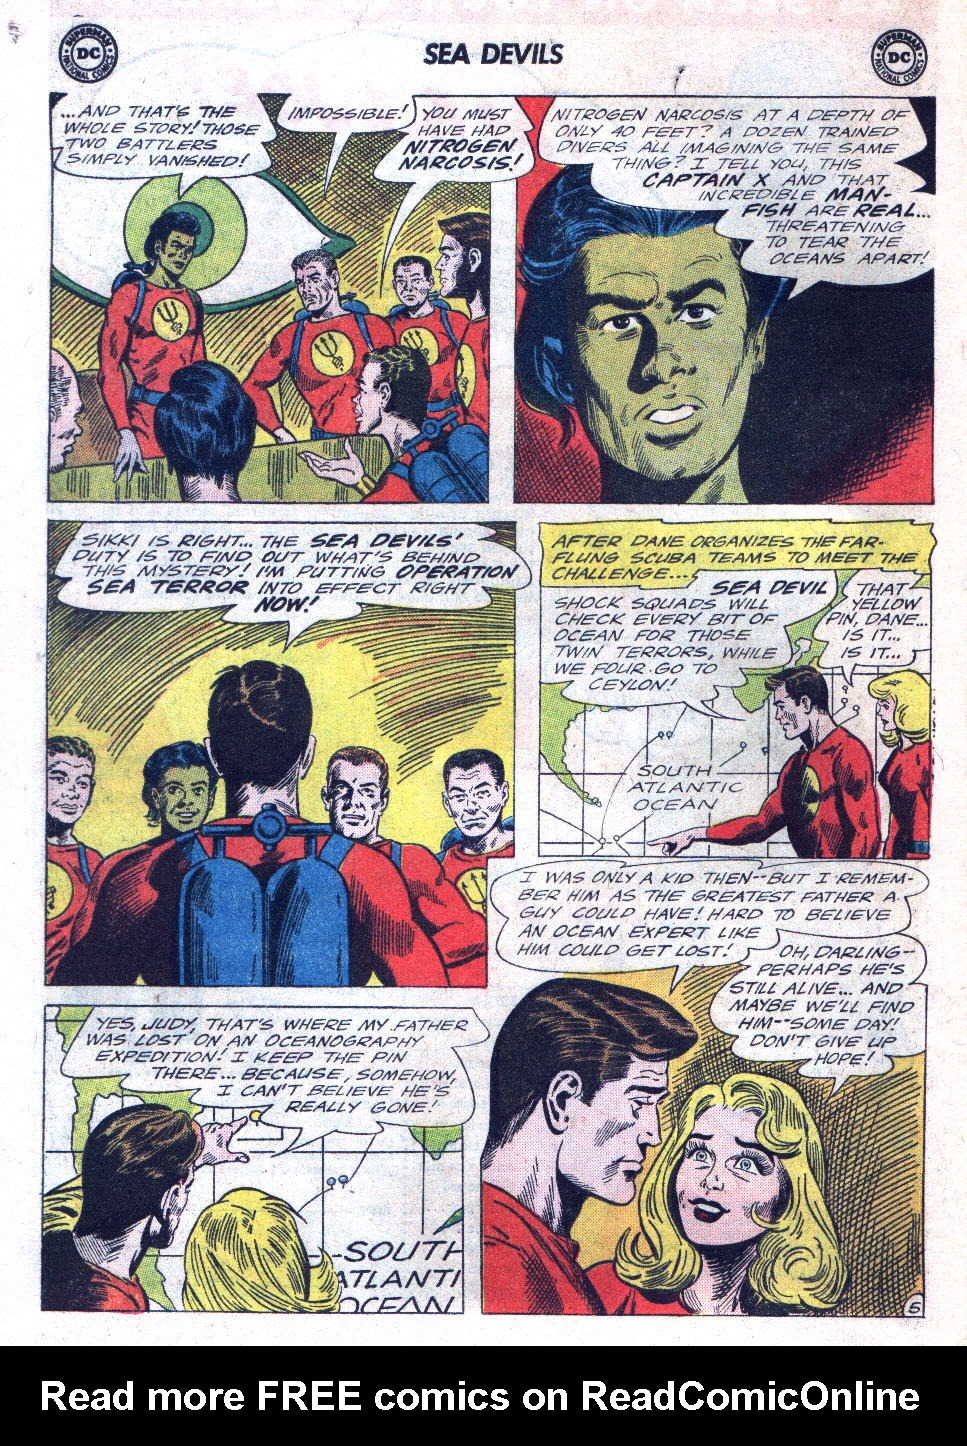 Read online Sea Devils comic -  Issue #22 - 8